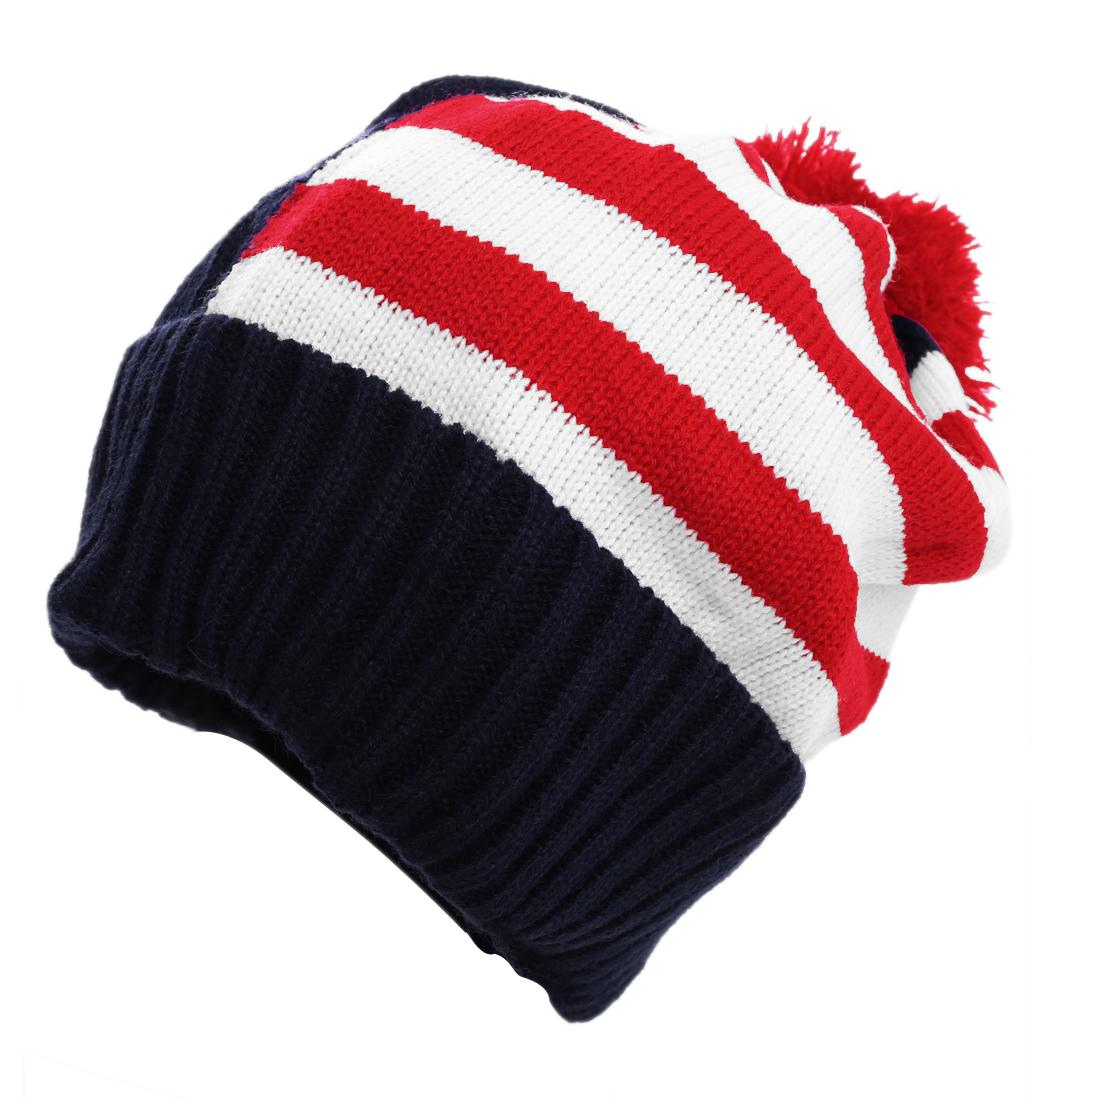 Men Dark Blue White Red Casual Knit Stripes Pattern Beanie Hat